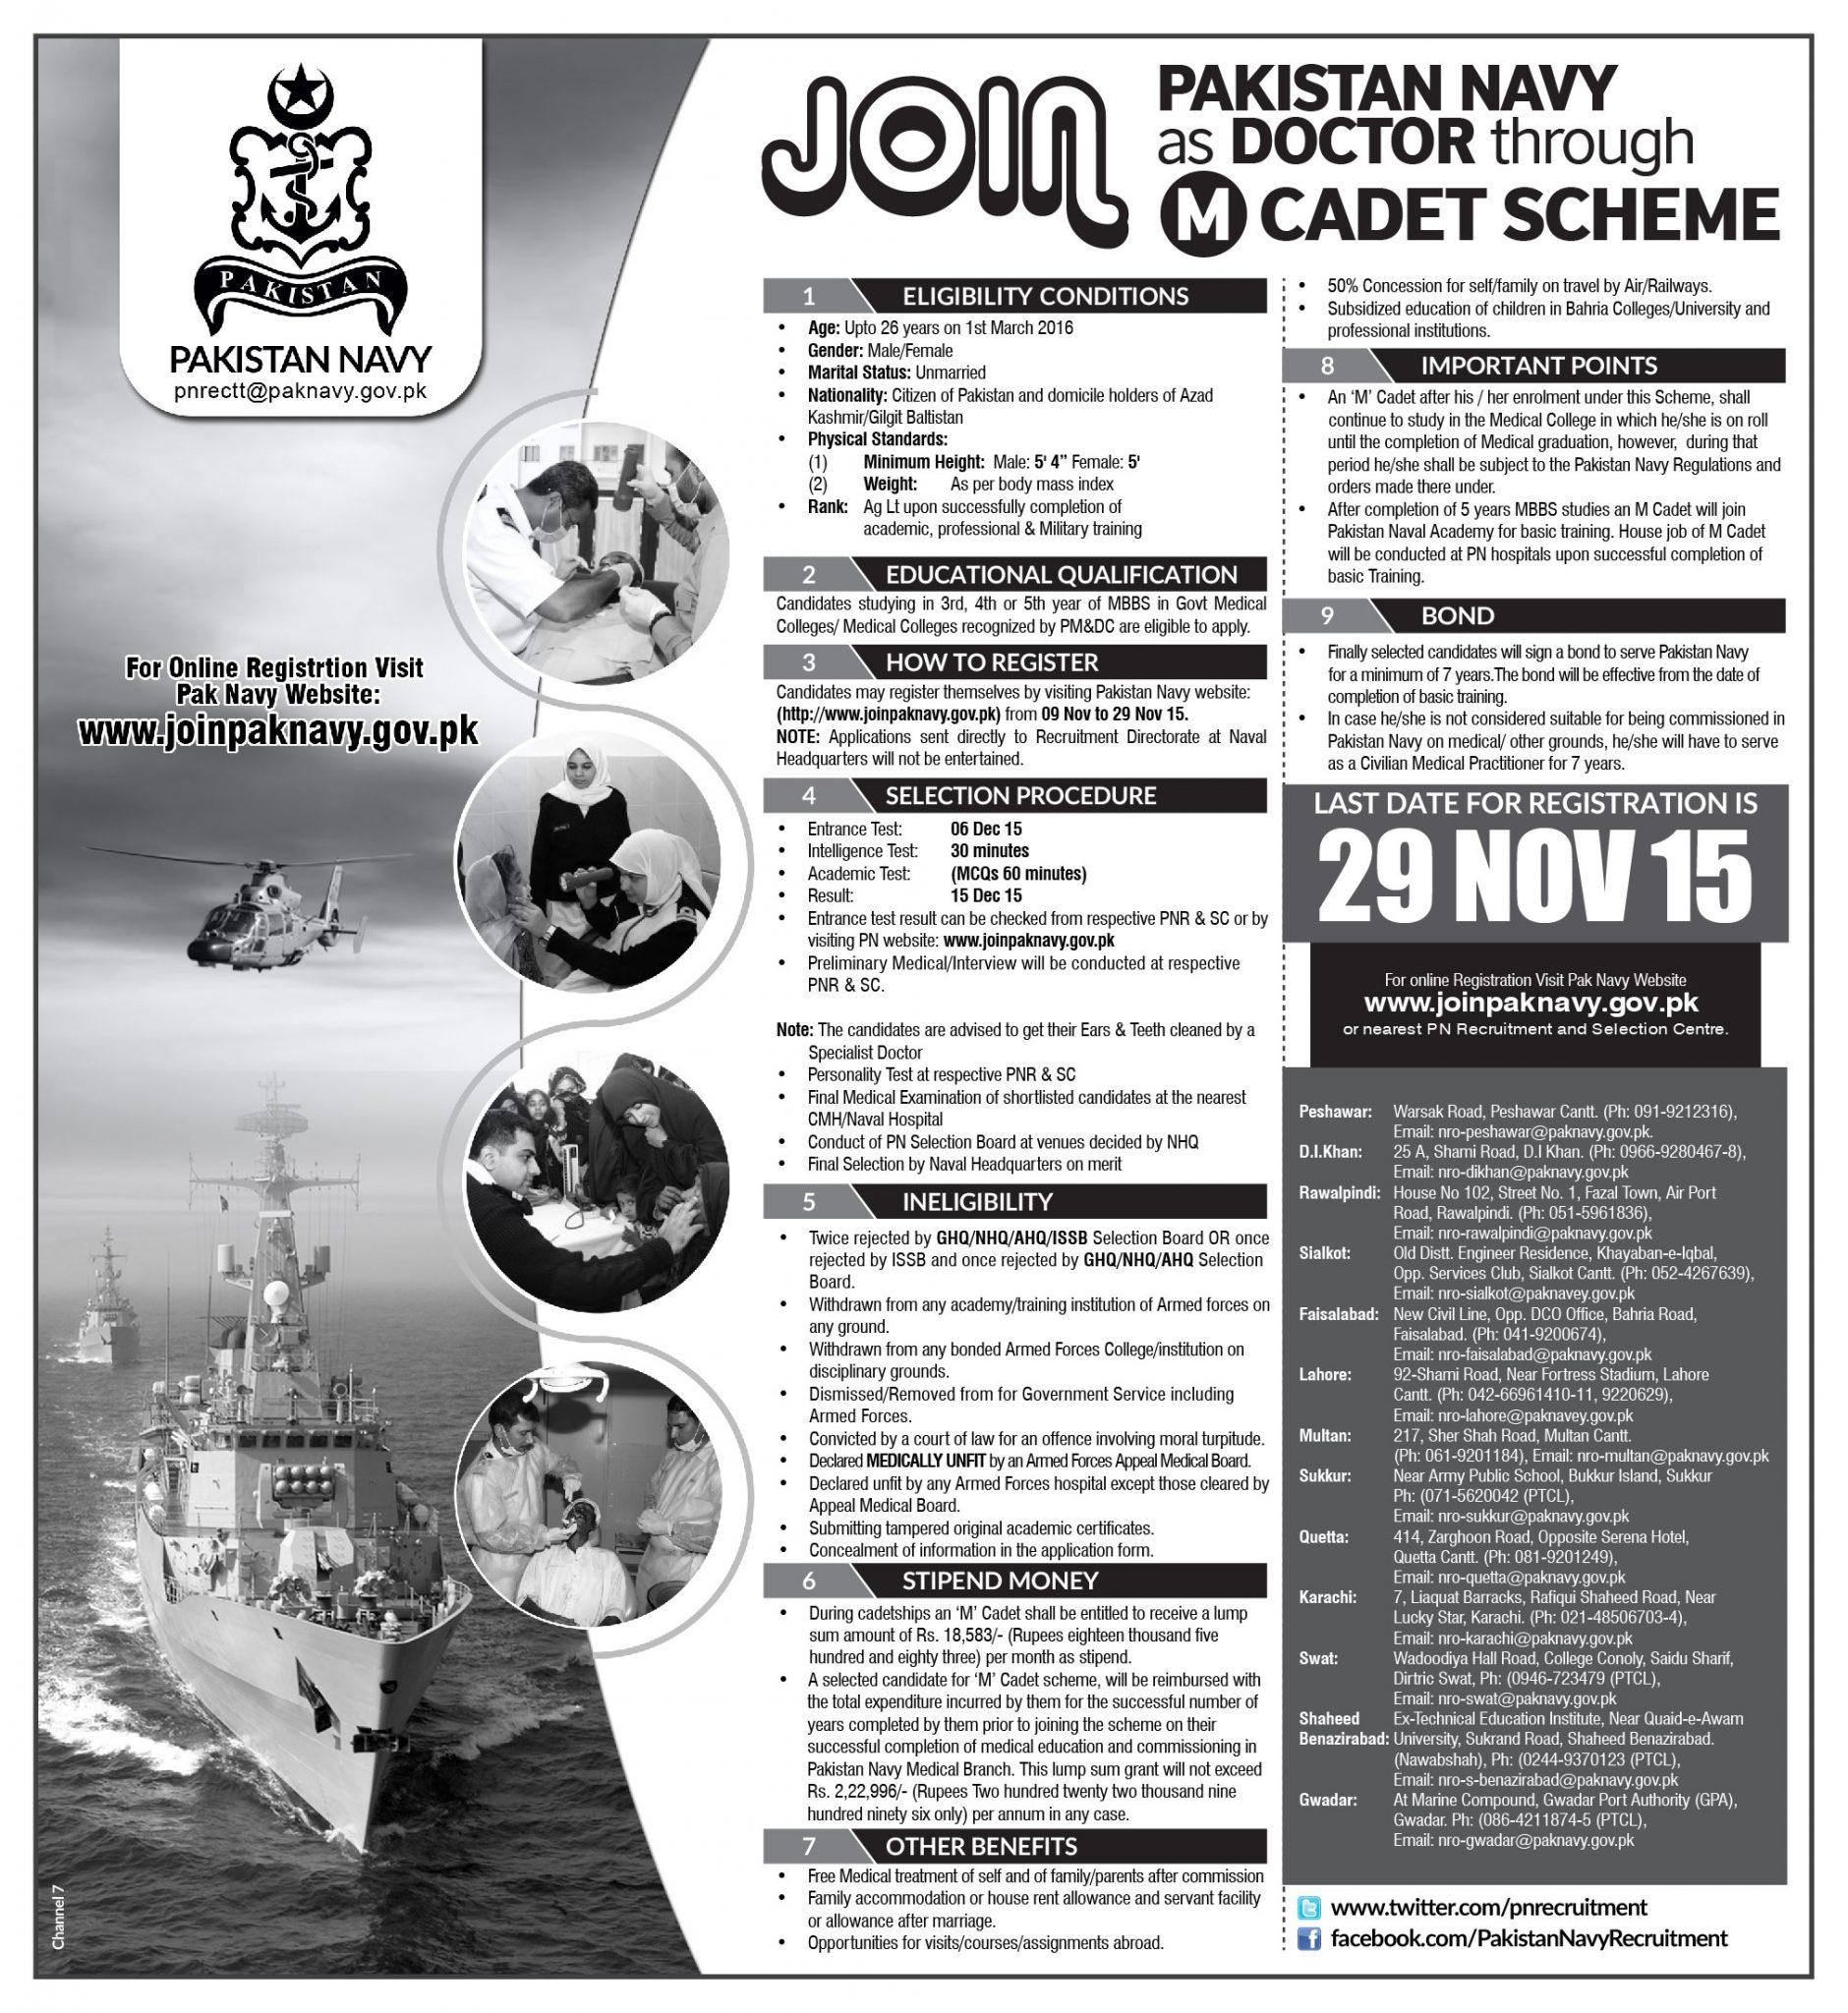 Join Pak Navy As a Doctor 2017 Scheme Online Registration ...